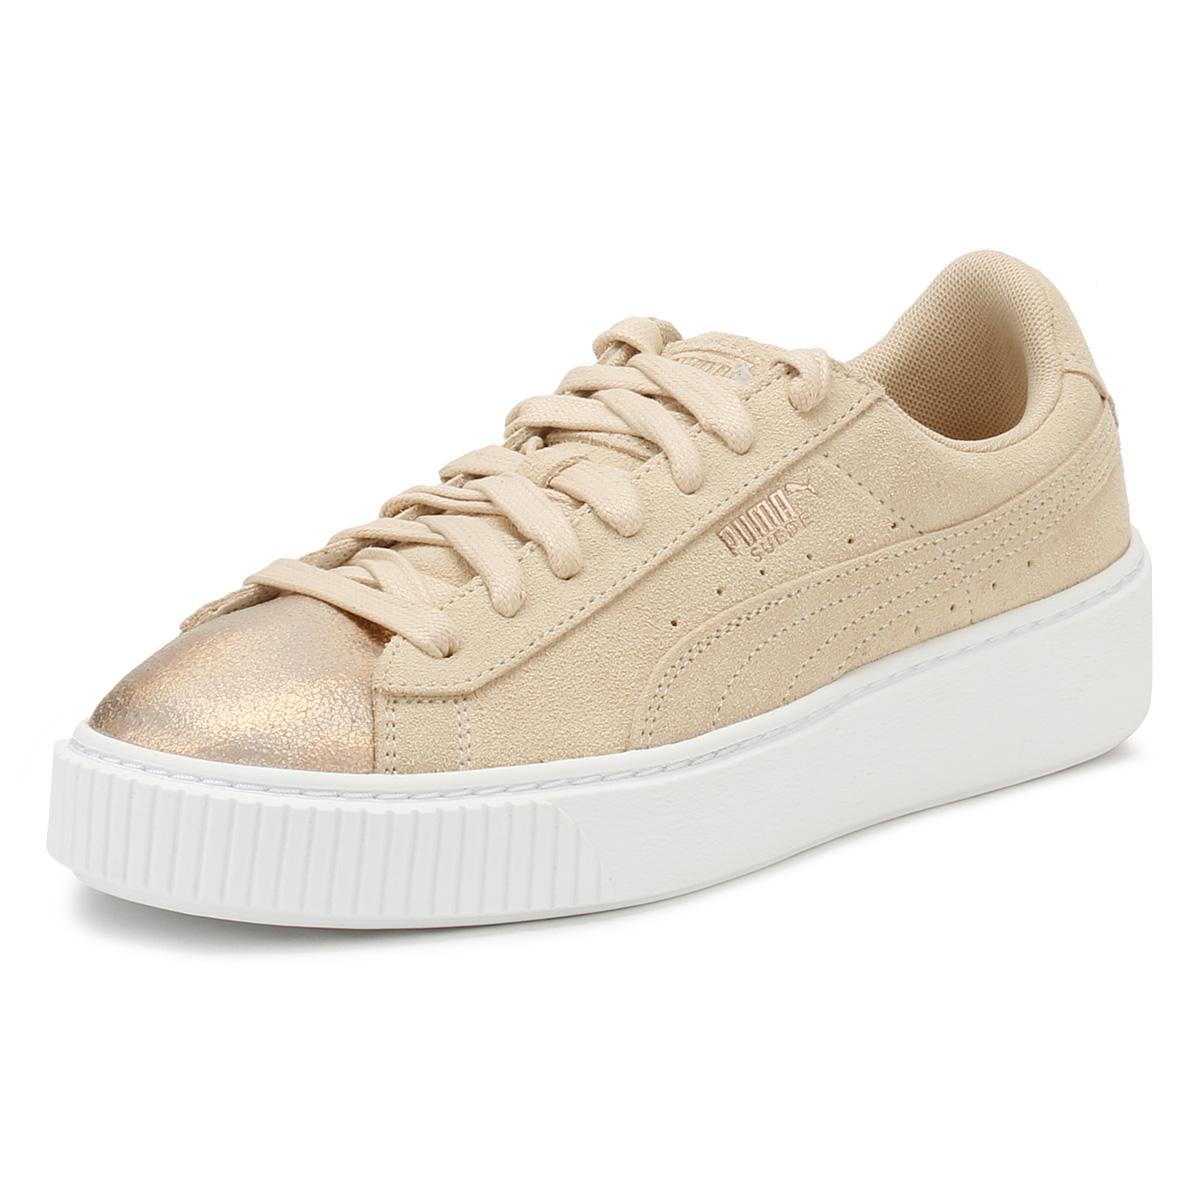 884093992eae9 PUMA Womens Trainers Cream Tan Platform Suede LunaLux Ladies Sport Casual  Shoes